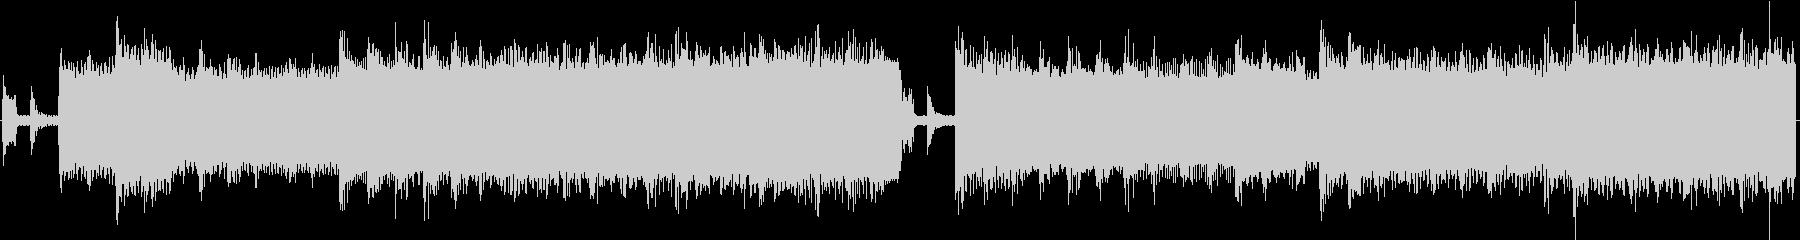 8bit コミカル、ポップなループBGMの未再生の波形